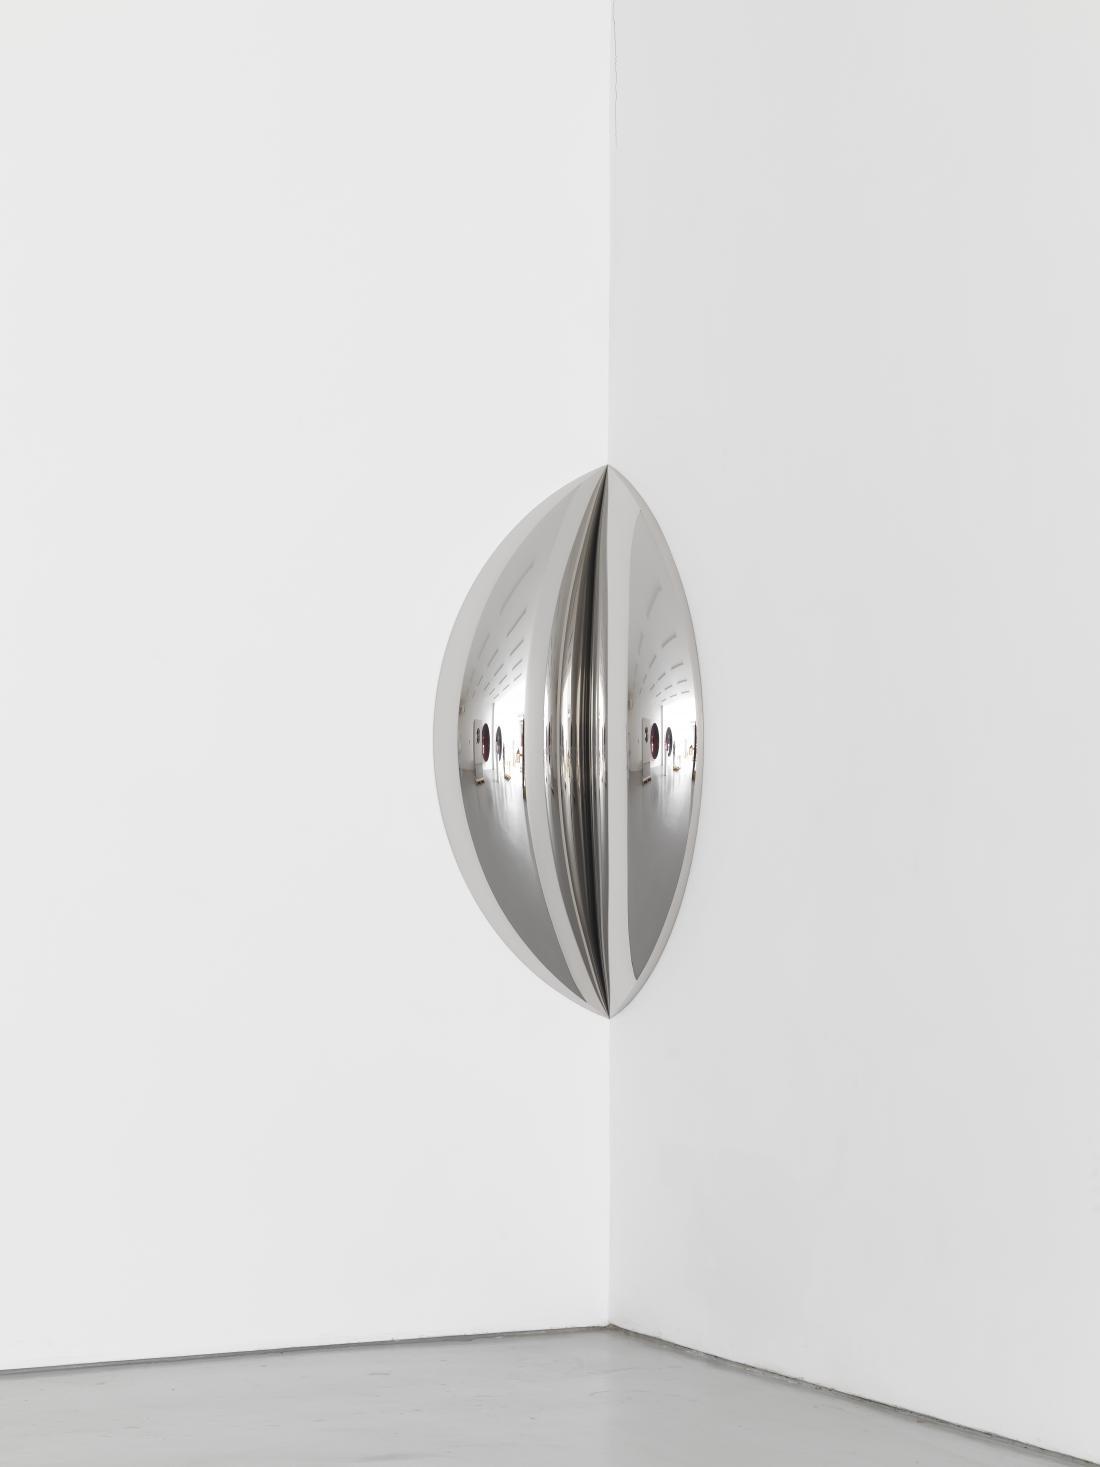 <i>Clip</i>, 2016, Stainless steel, 150 x 75 x 41 cm